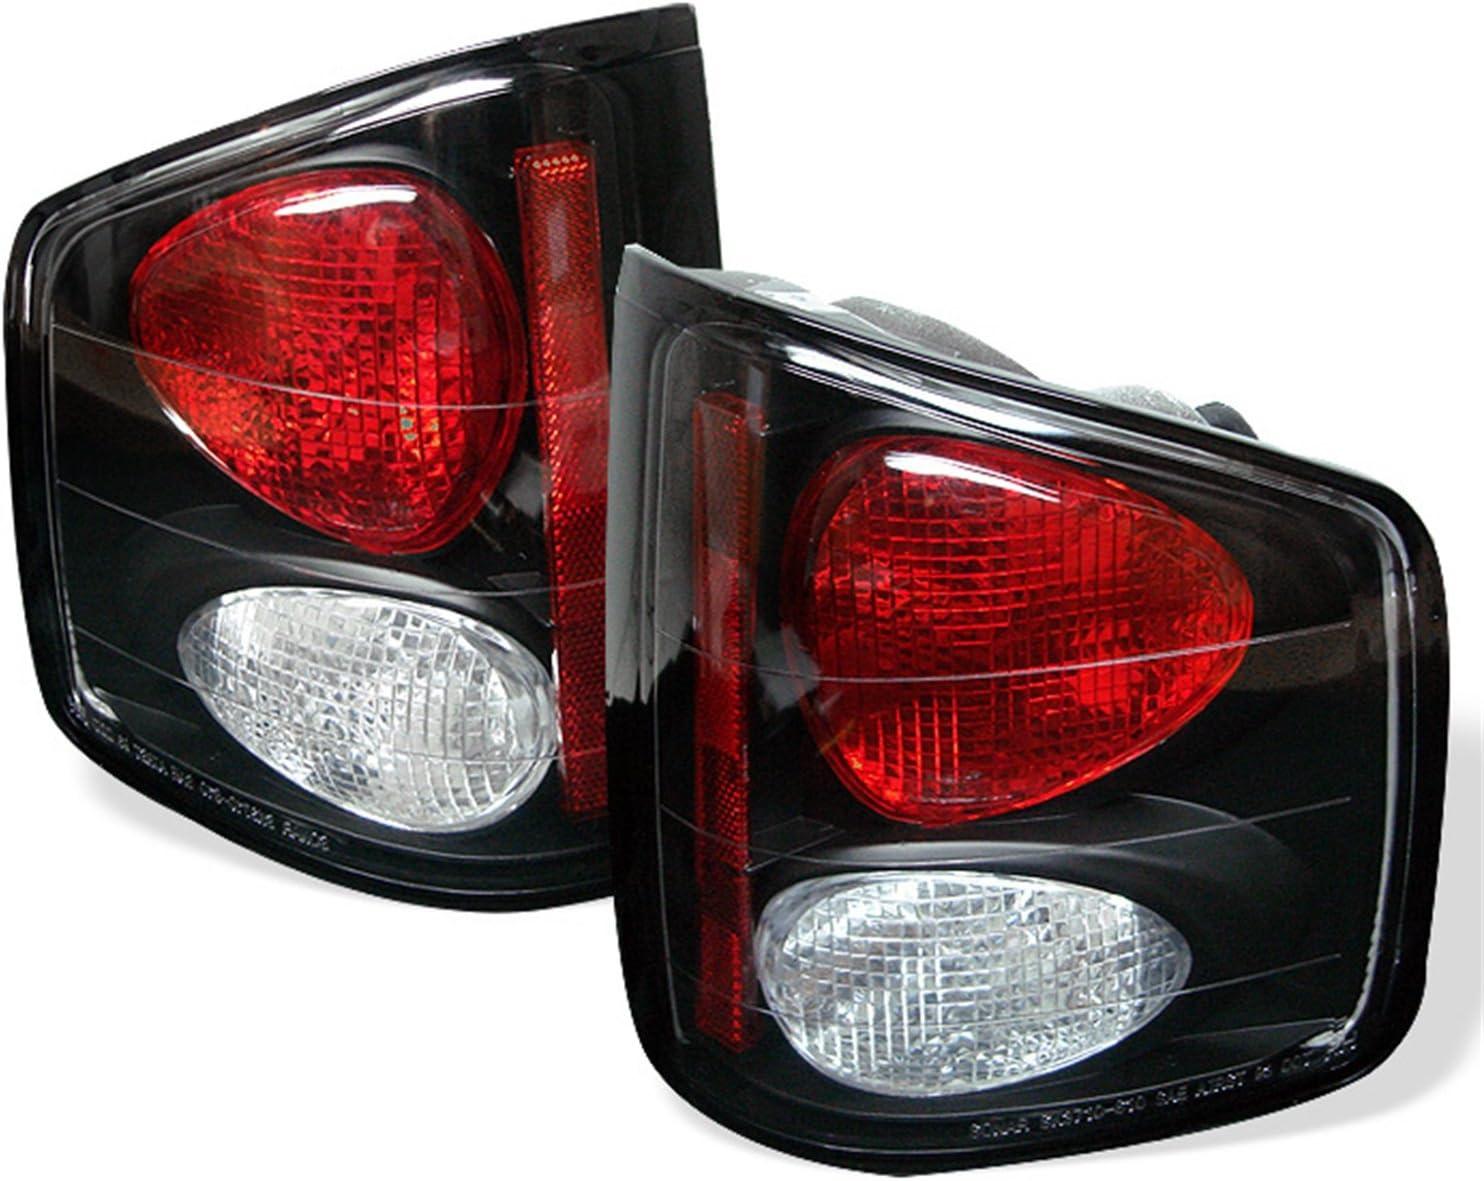 2PCS TYC Tail Light Assembly Fit Chevrolet S10// GMC Sonoma// Isuzu Hombre